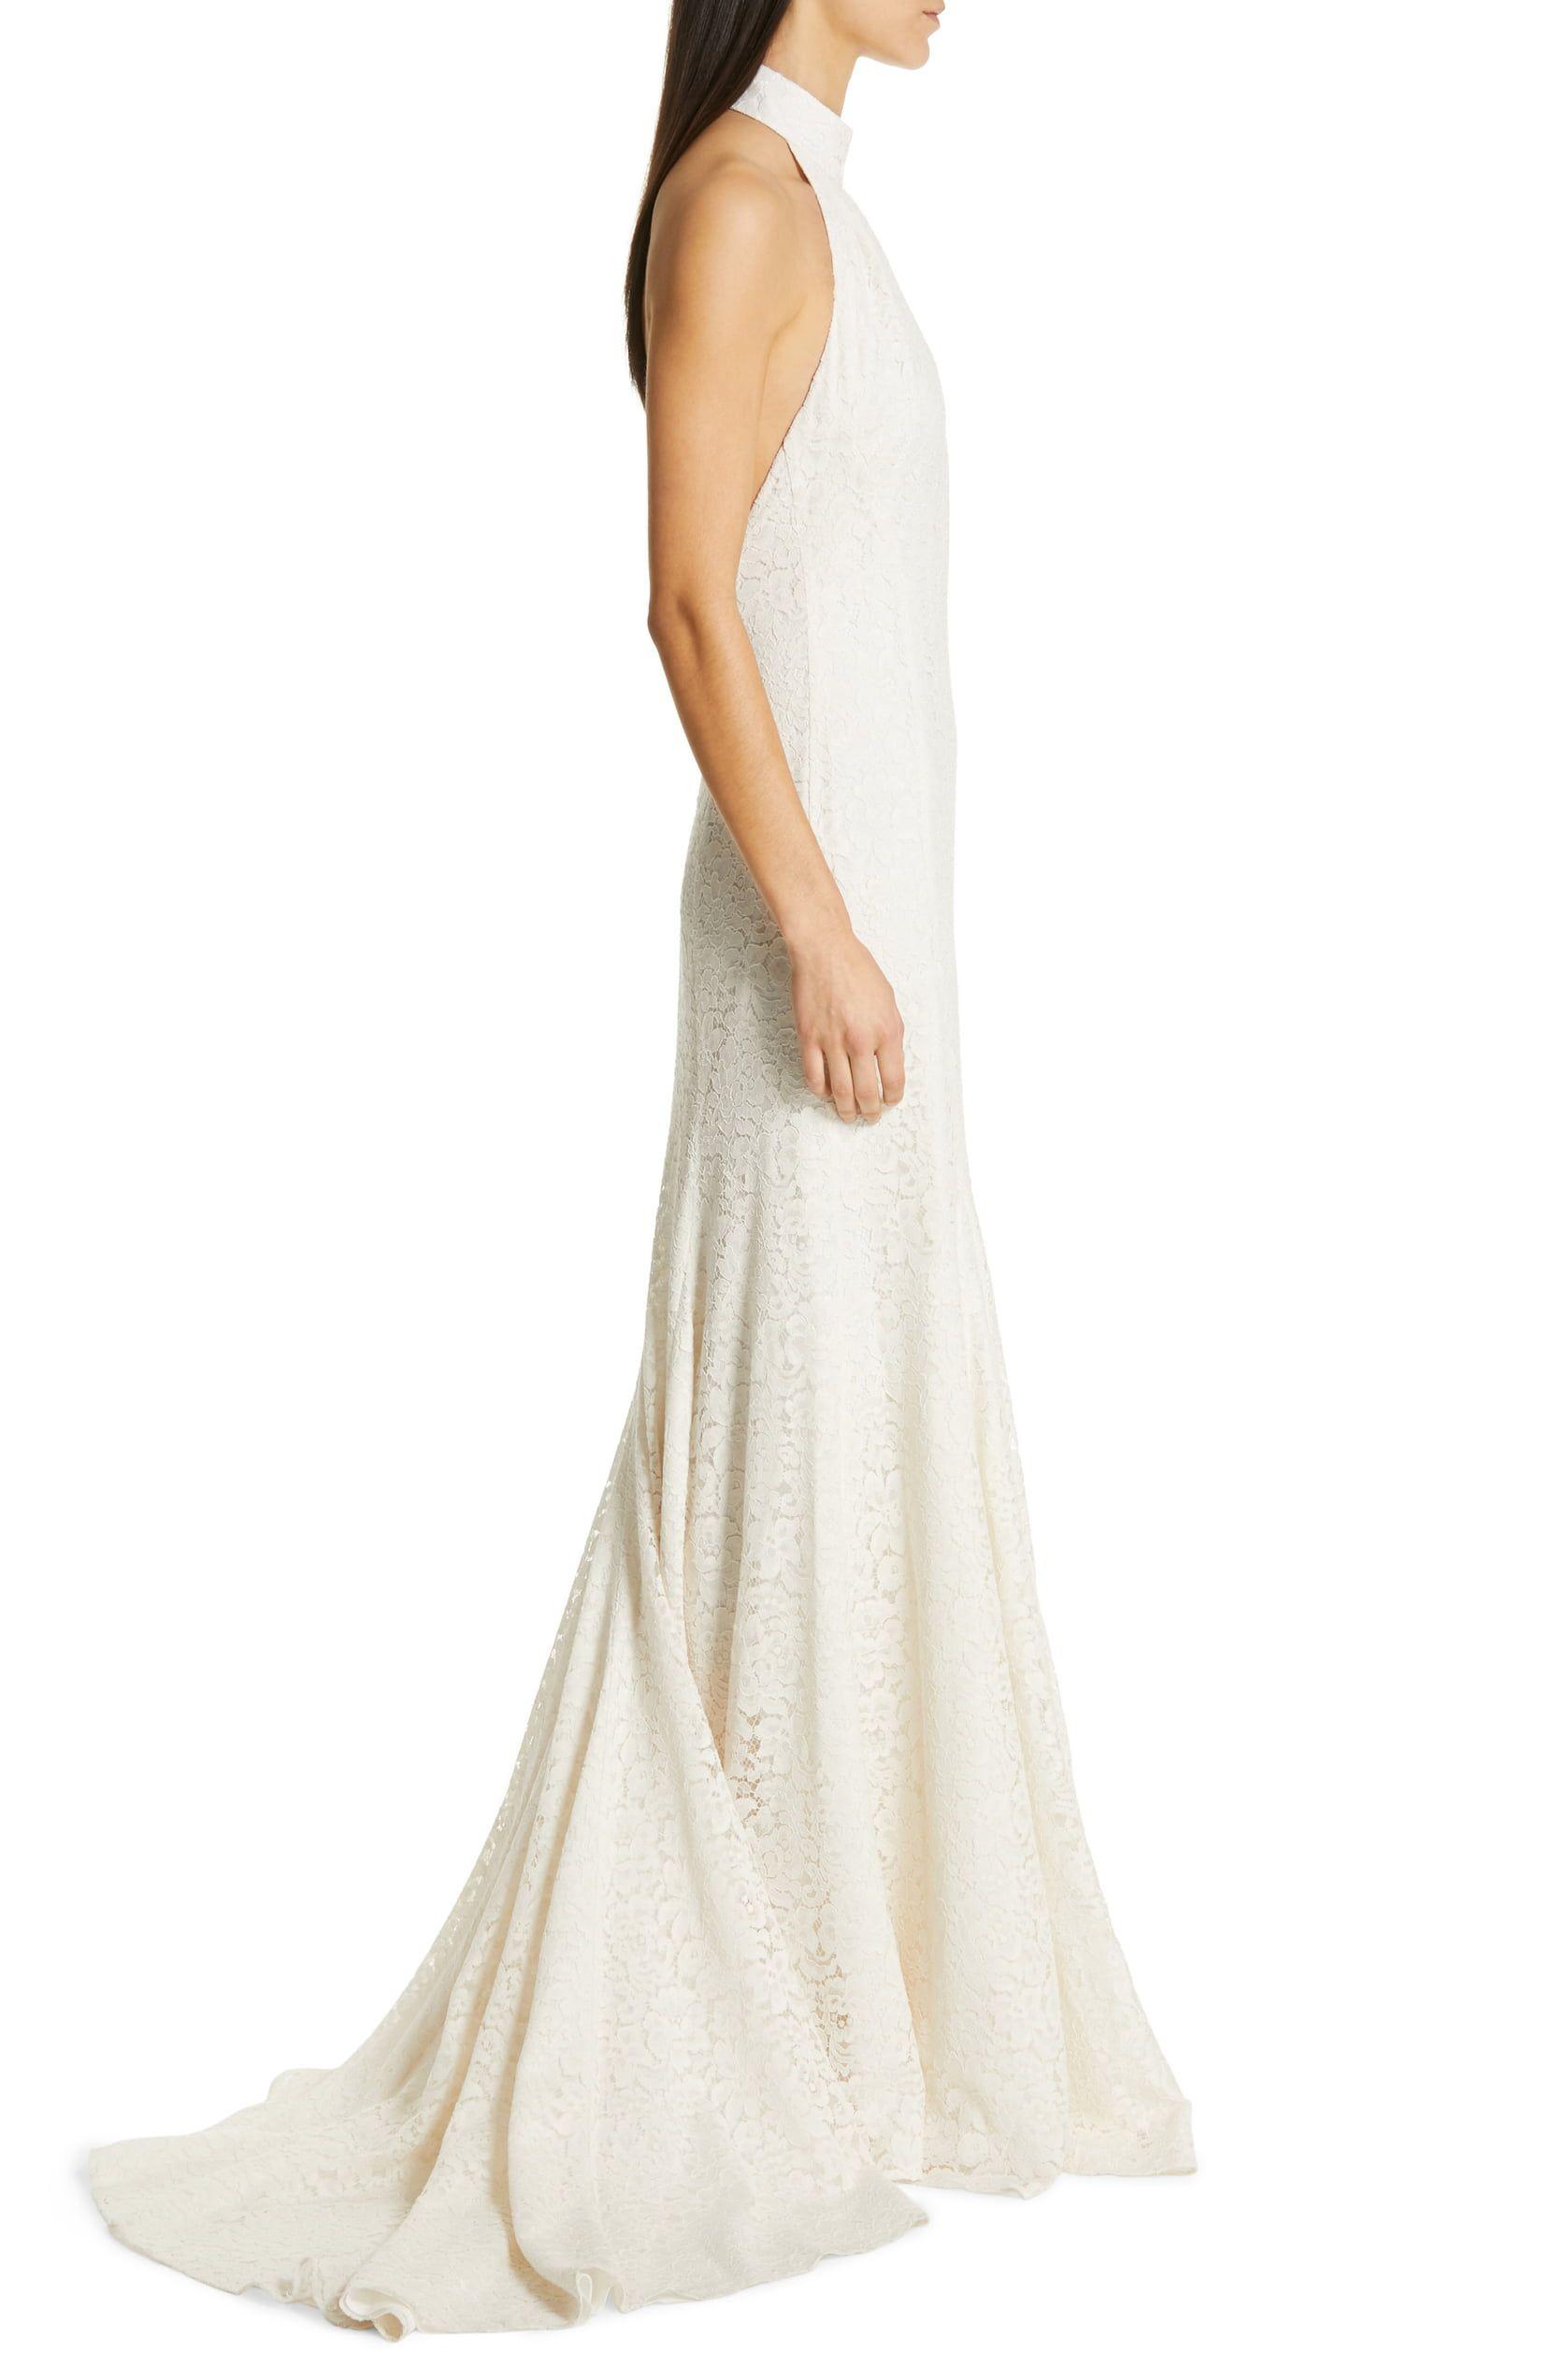 43+ Stella mccartney wedding dress nordstrom ideas in 2021